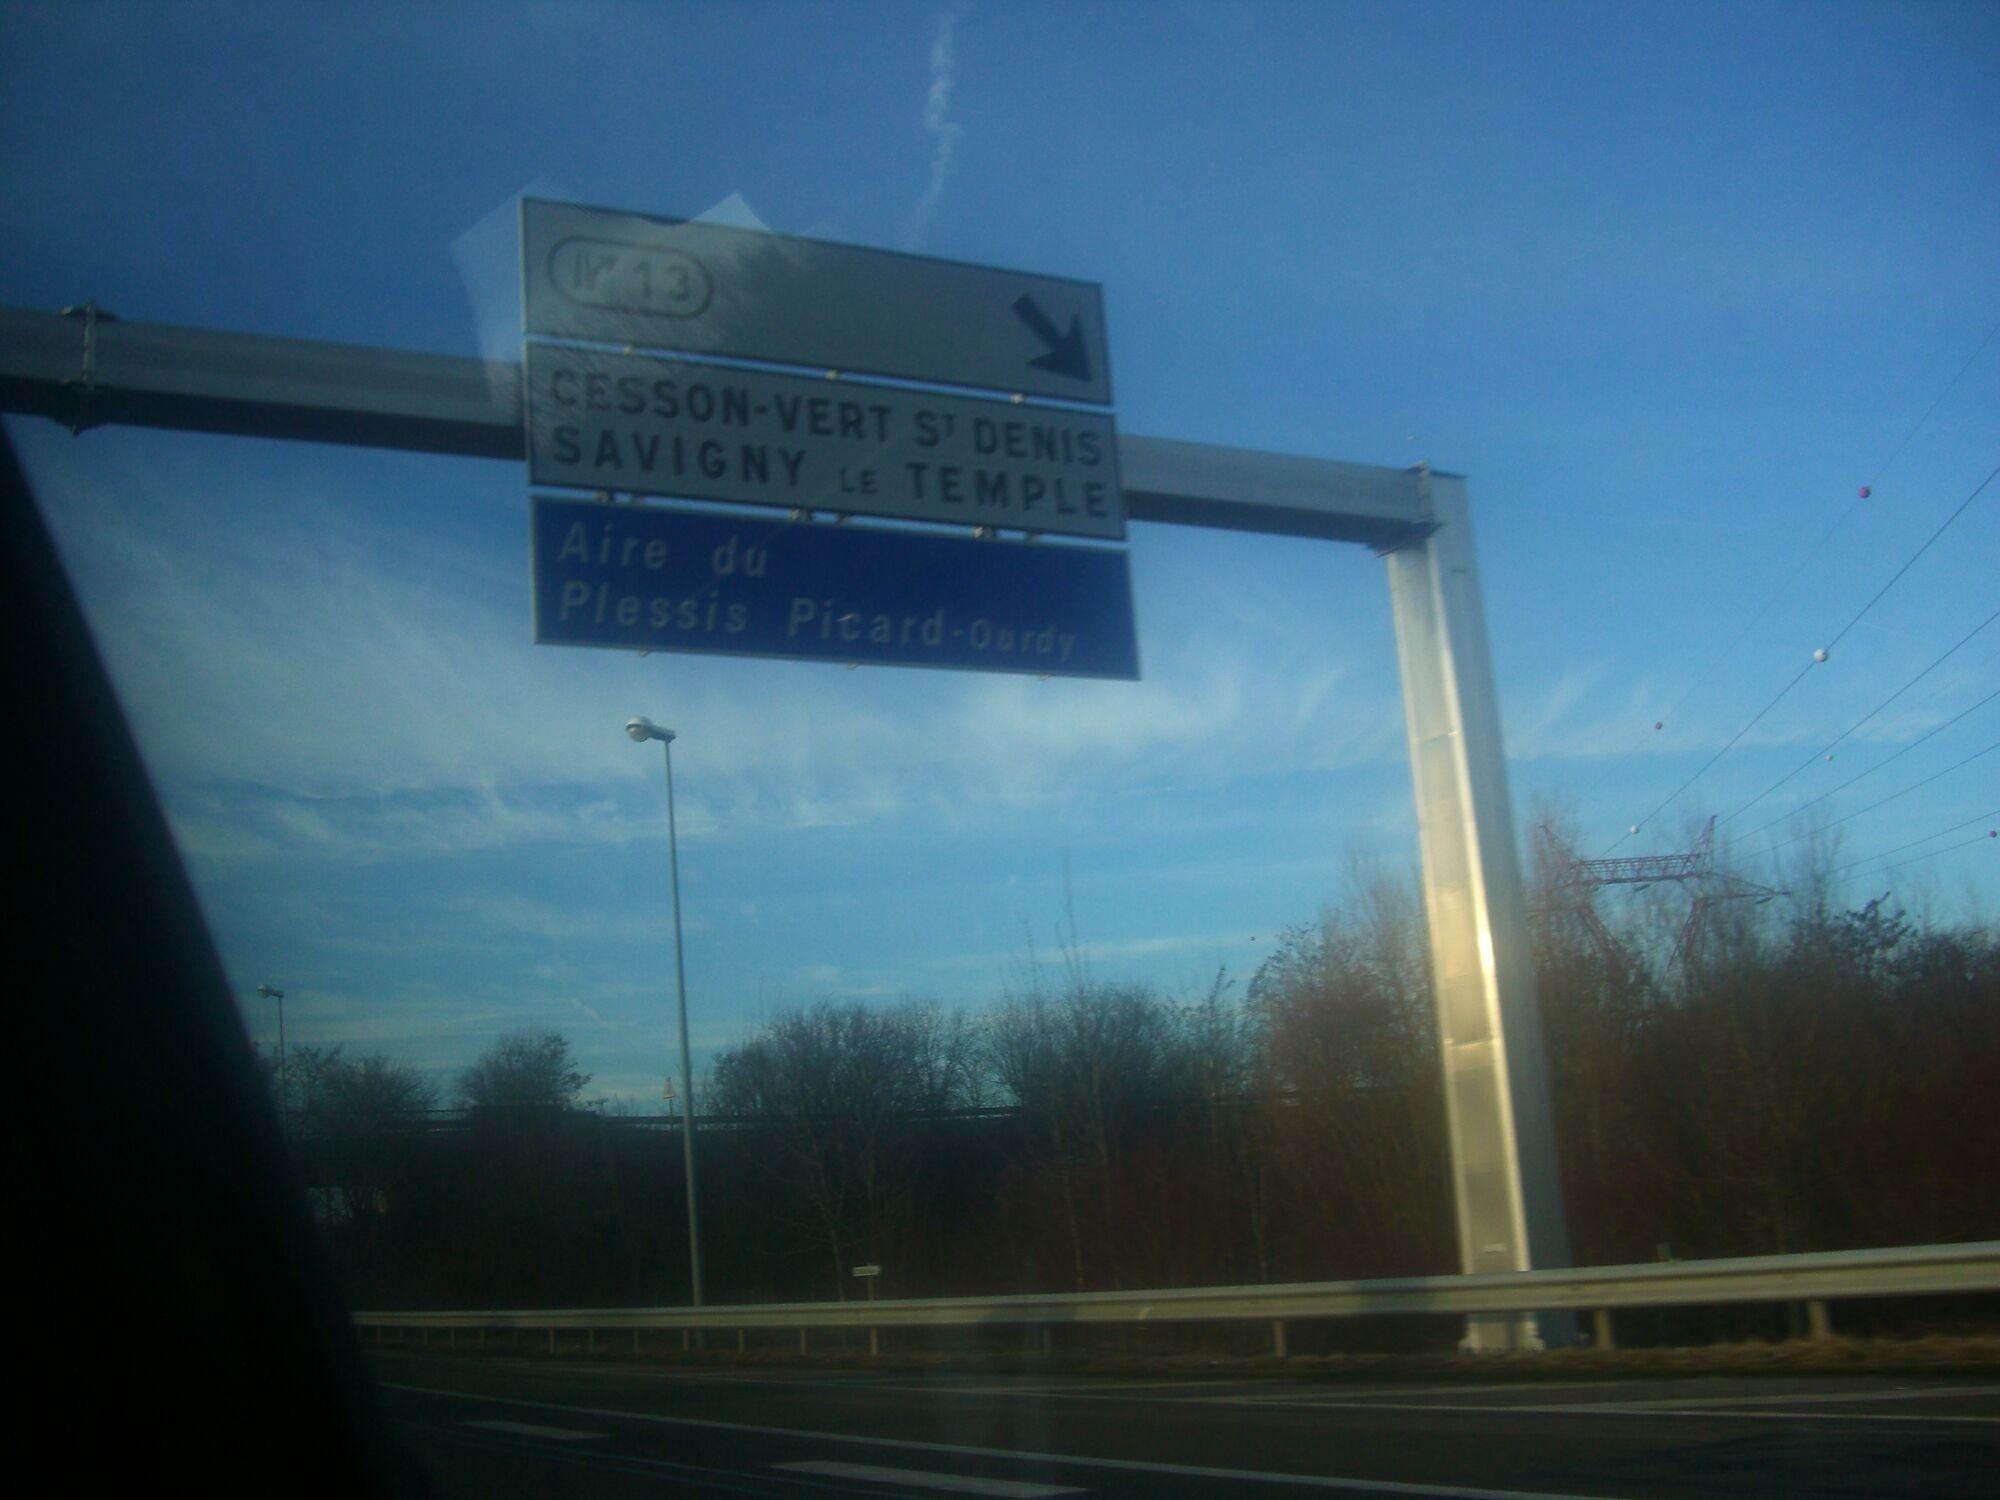 autoroute française a5 (aires) | wikisara | fandom poweredwikia